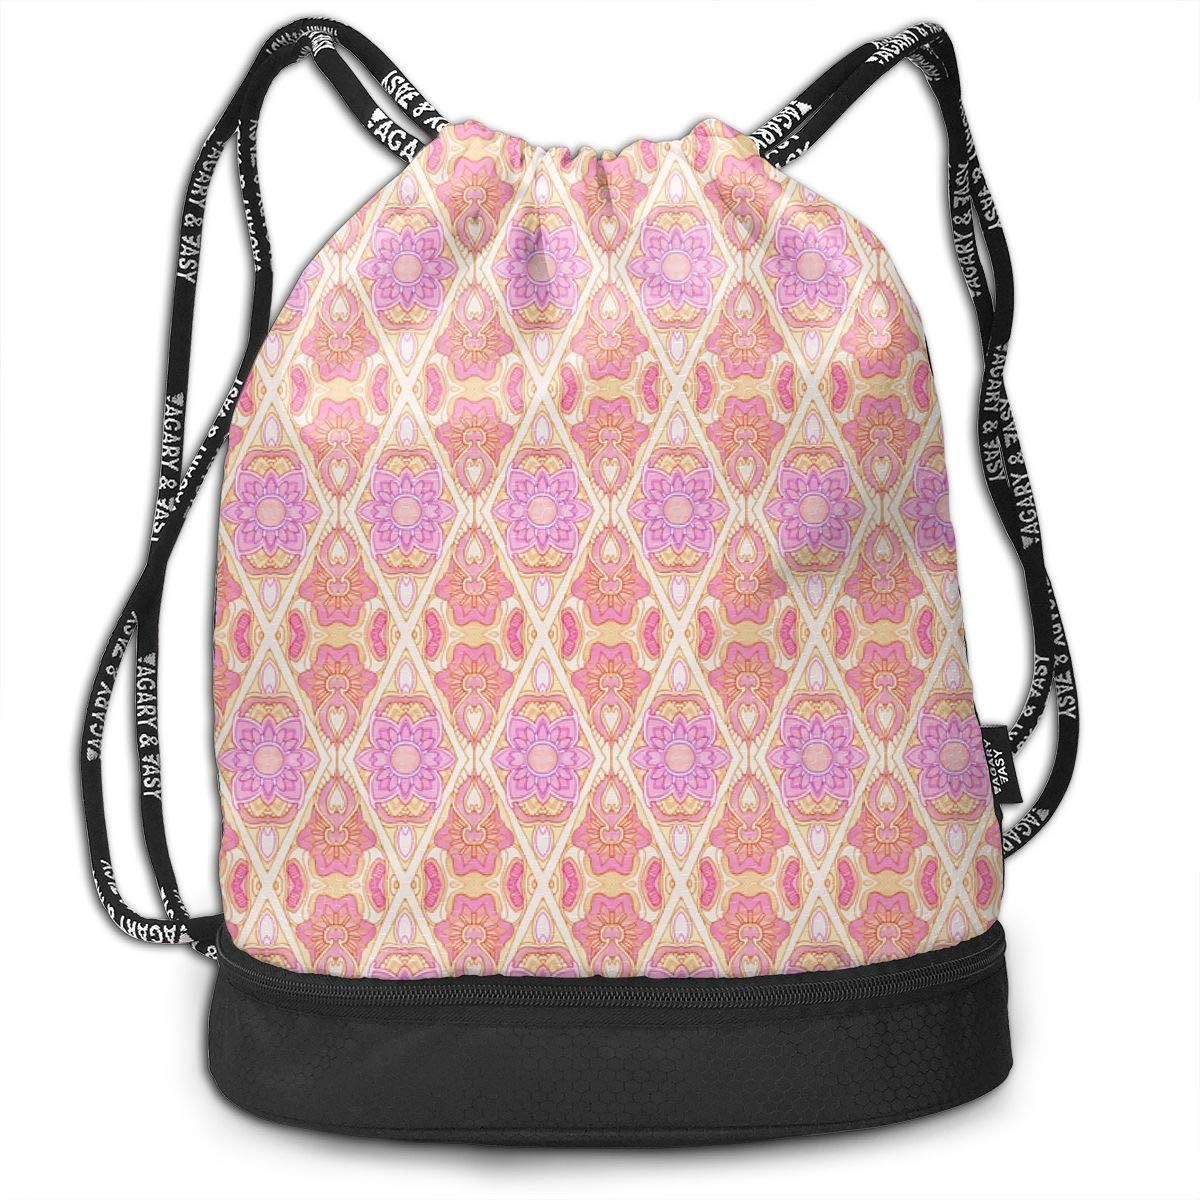 Wallflower Seranade Drawstring Backpack Sports Athletic Gym Cinch Sack String Storage Bags for Hiking Travel Beach